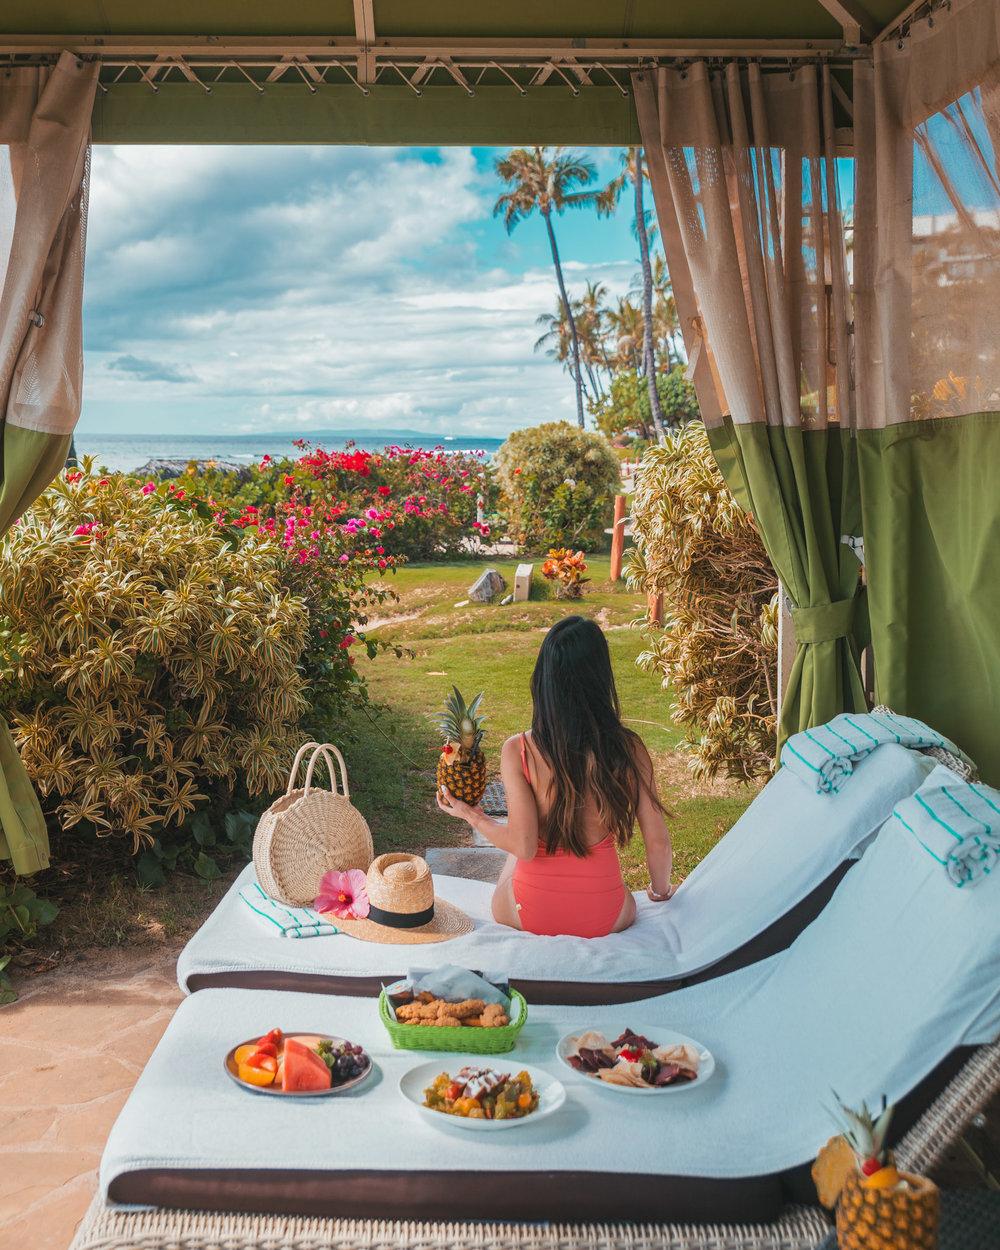 Ohana cabana by the pool at Hyatt Regency Maui  // The Quick Guide to Visiting Maui, Hawaii #readysetjetset #hawaii #maui